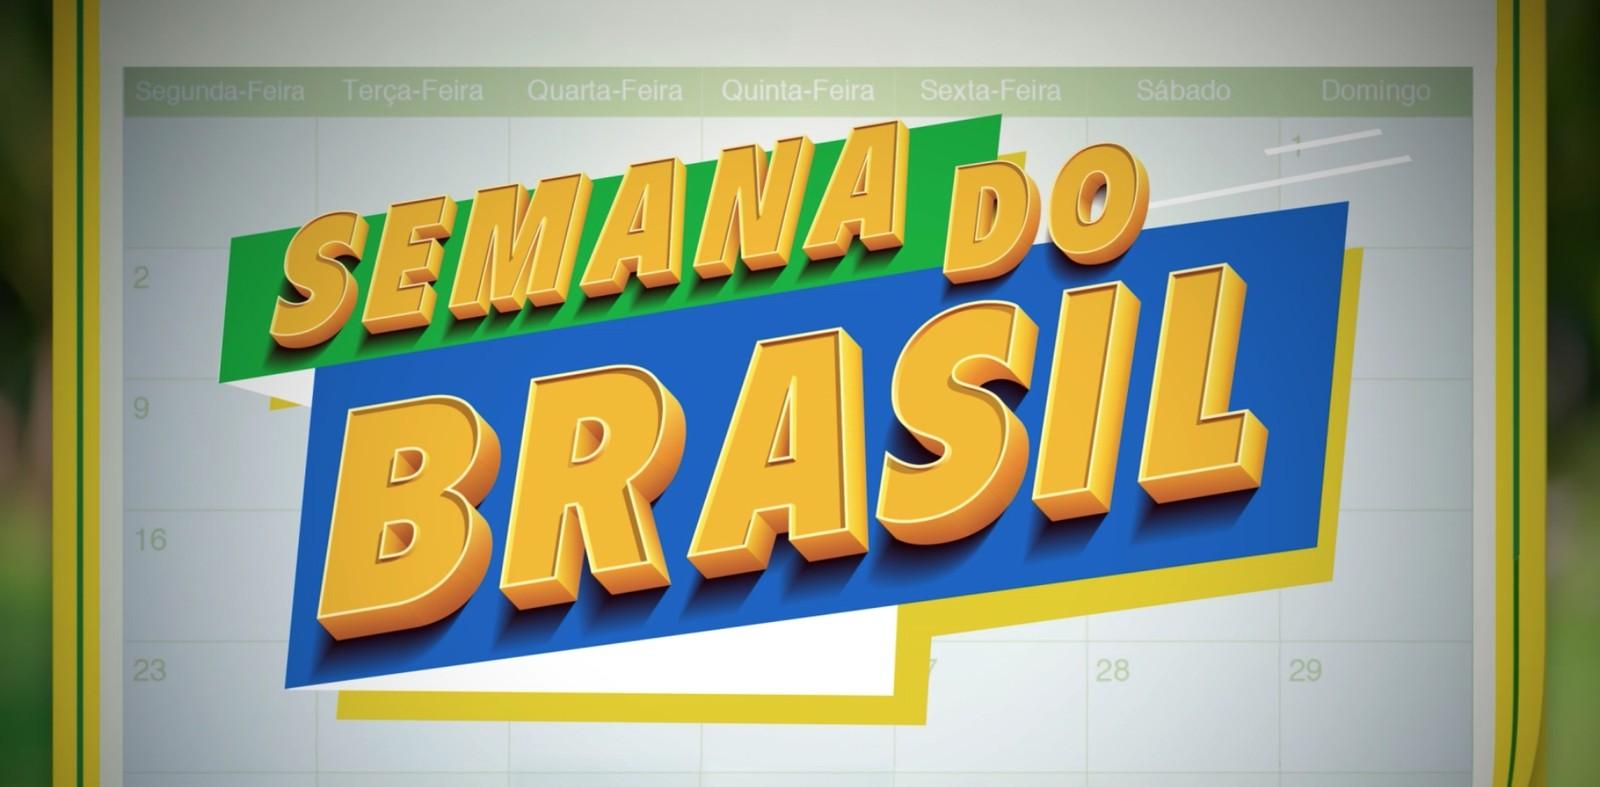 Promoções Semana do Brasil